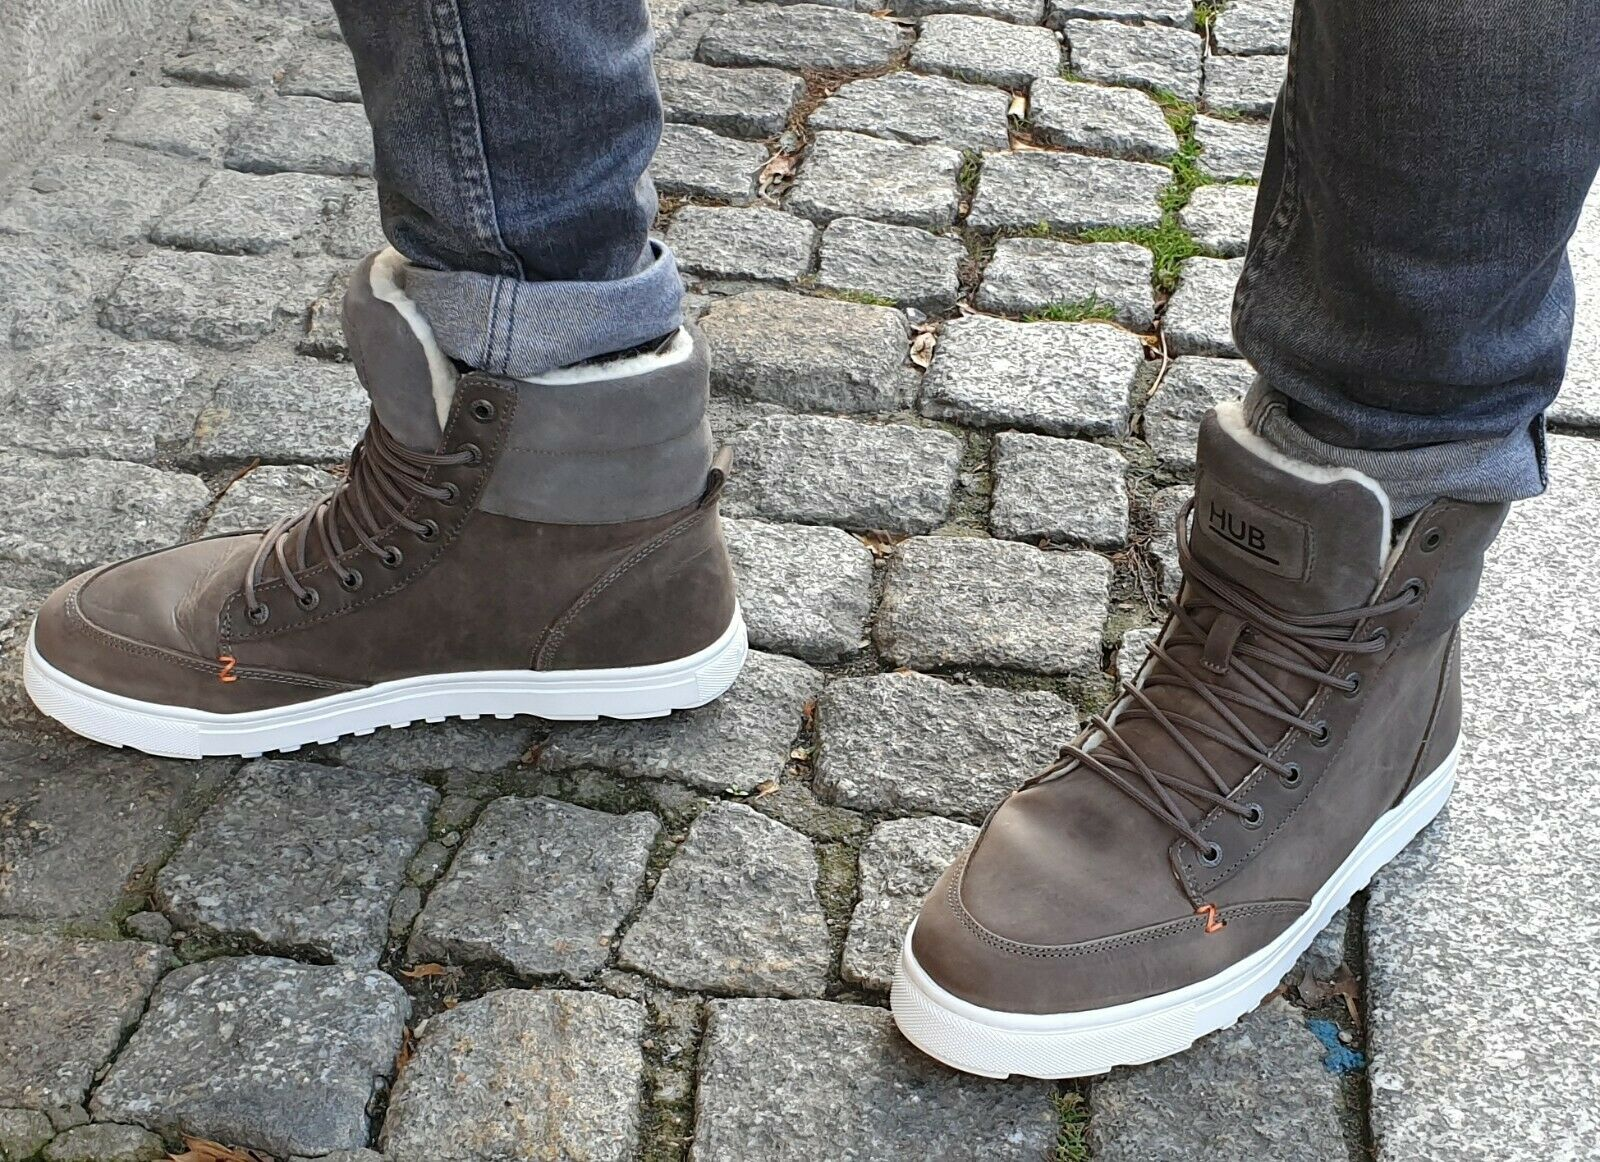 HUB FOOTWEARE Schuh Grau Dublin M2904L47-L04-005 Herren Echtleder Winterschuh